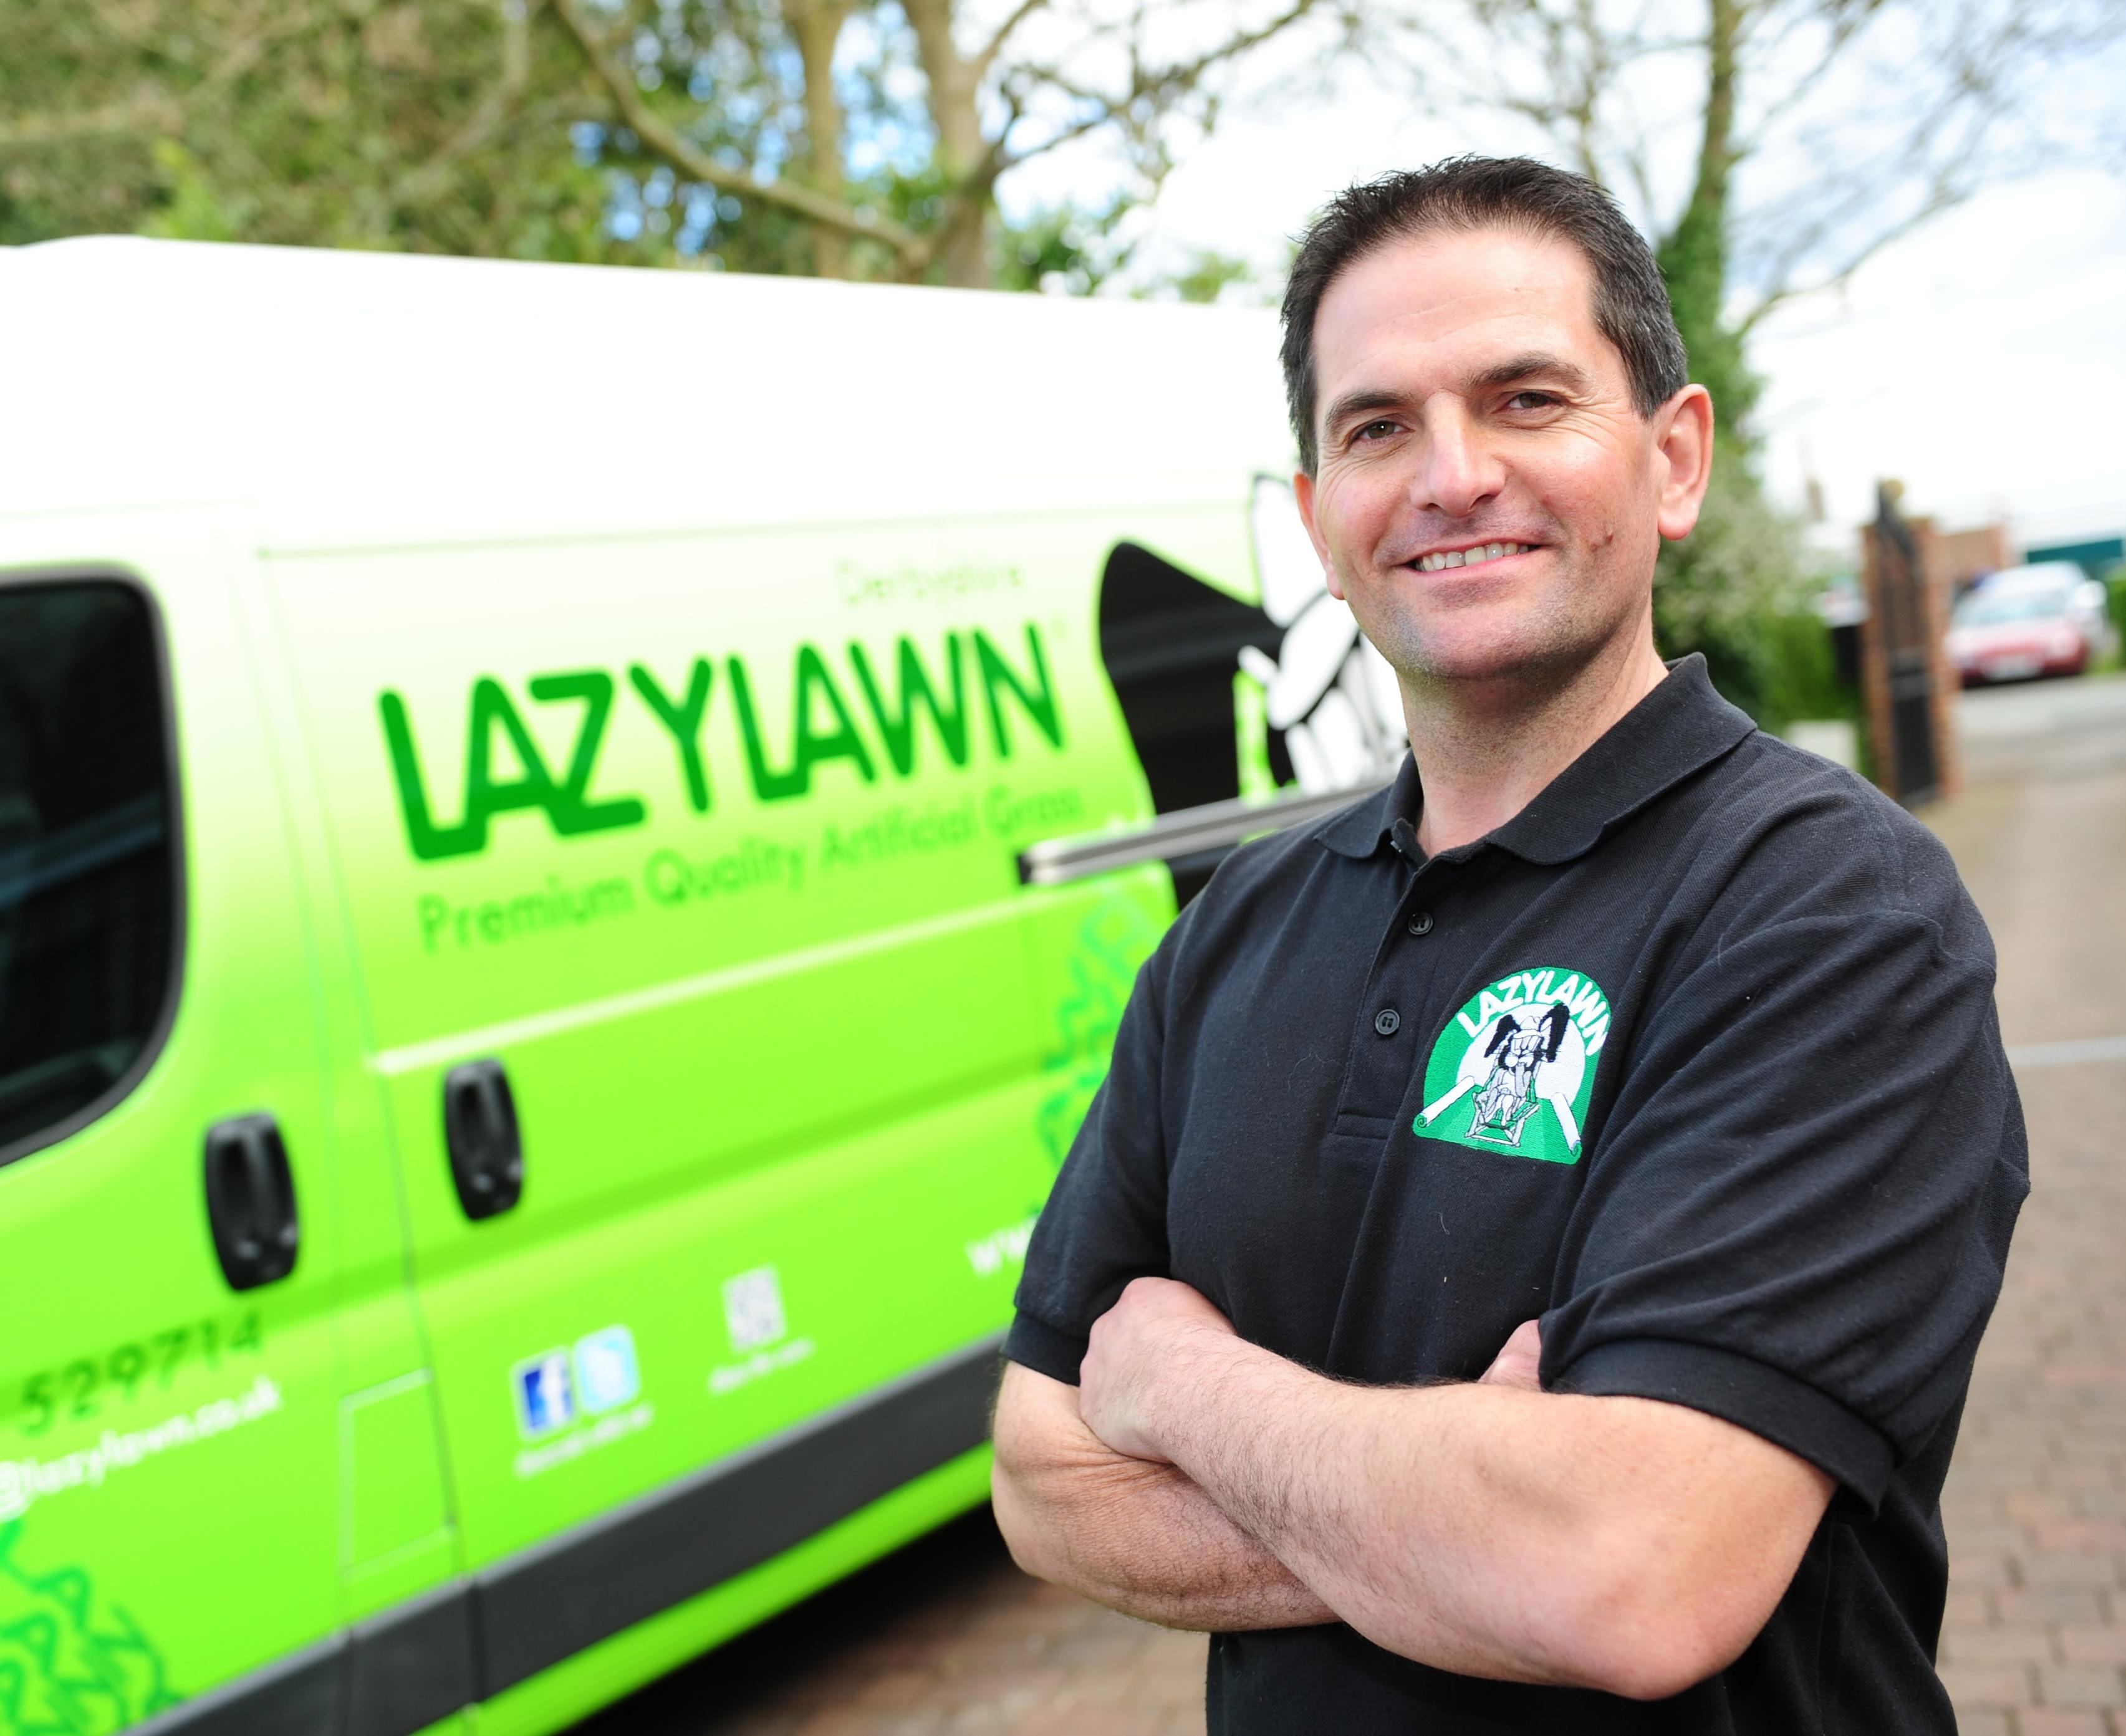 LazyLawn® Scotland